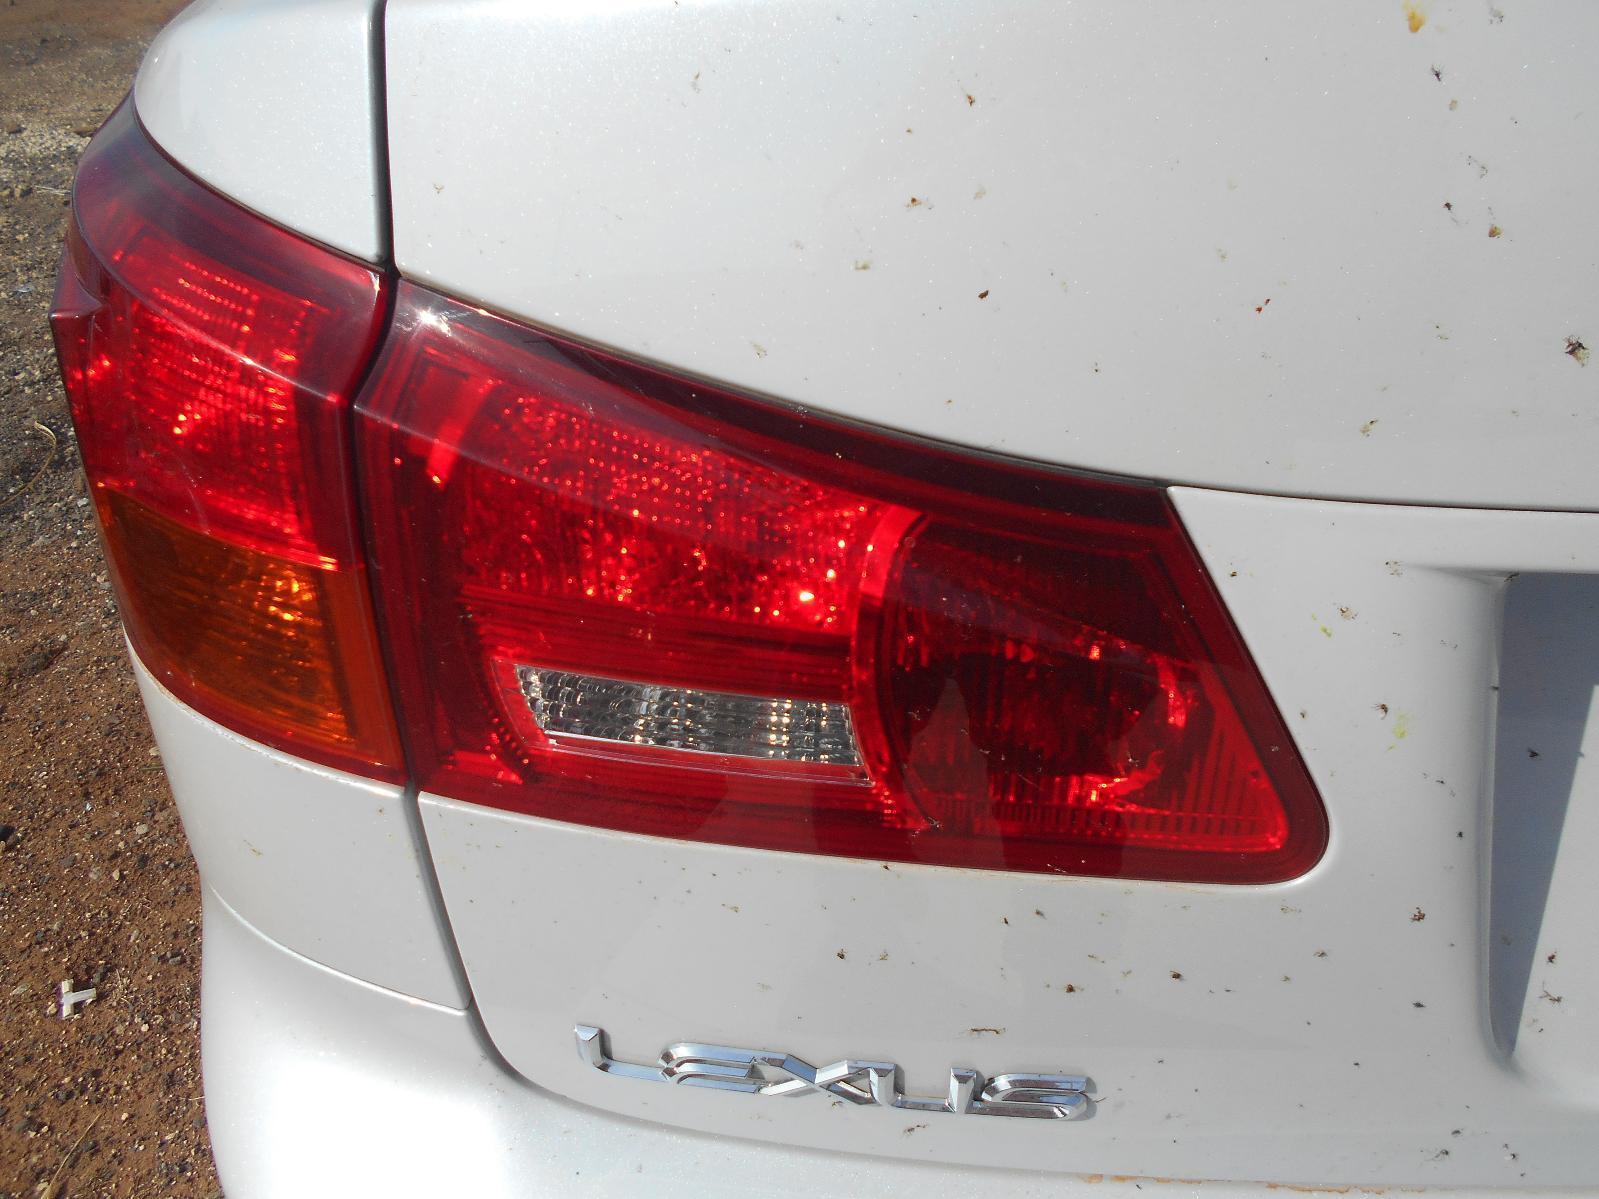 LEXUS IS250/IS250C, Rear Garnish, IS250, BOOTLID LAMP (LH SIDE), GSE20R, SEDAN, 11/05-09/08